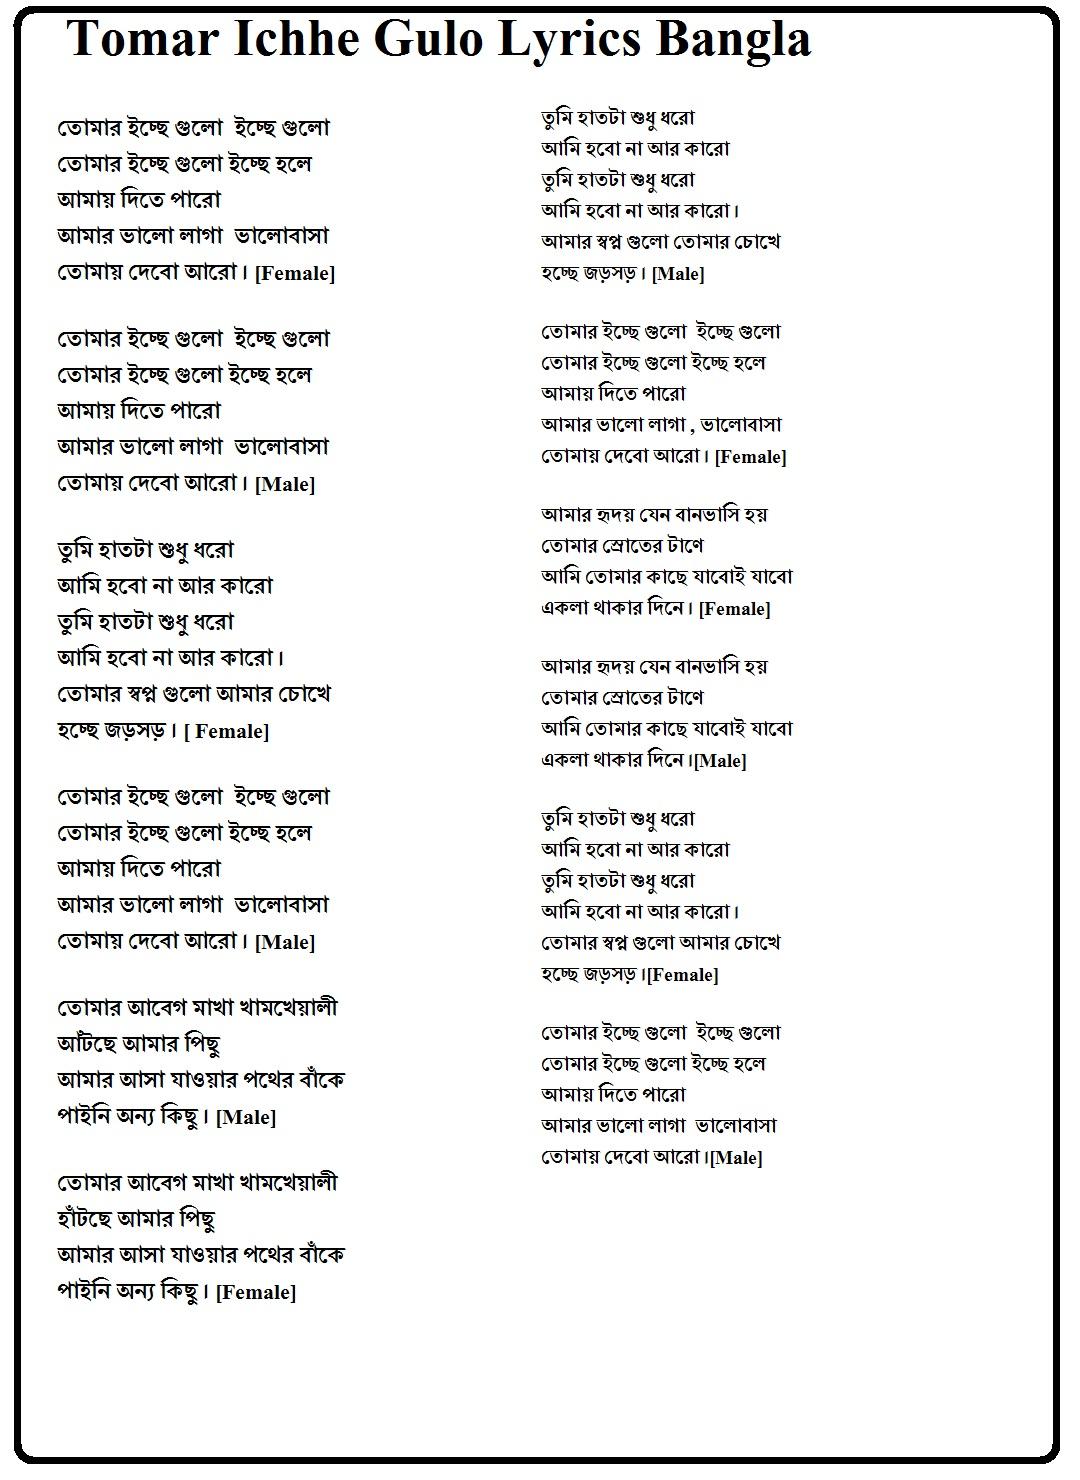 Tomar Ichhe Gulo Lyrics Bangla